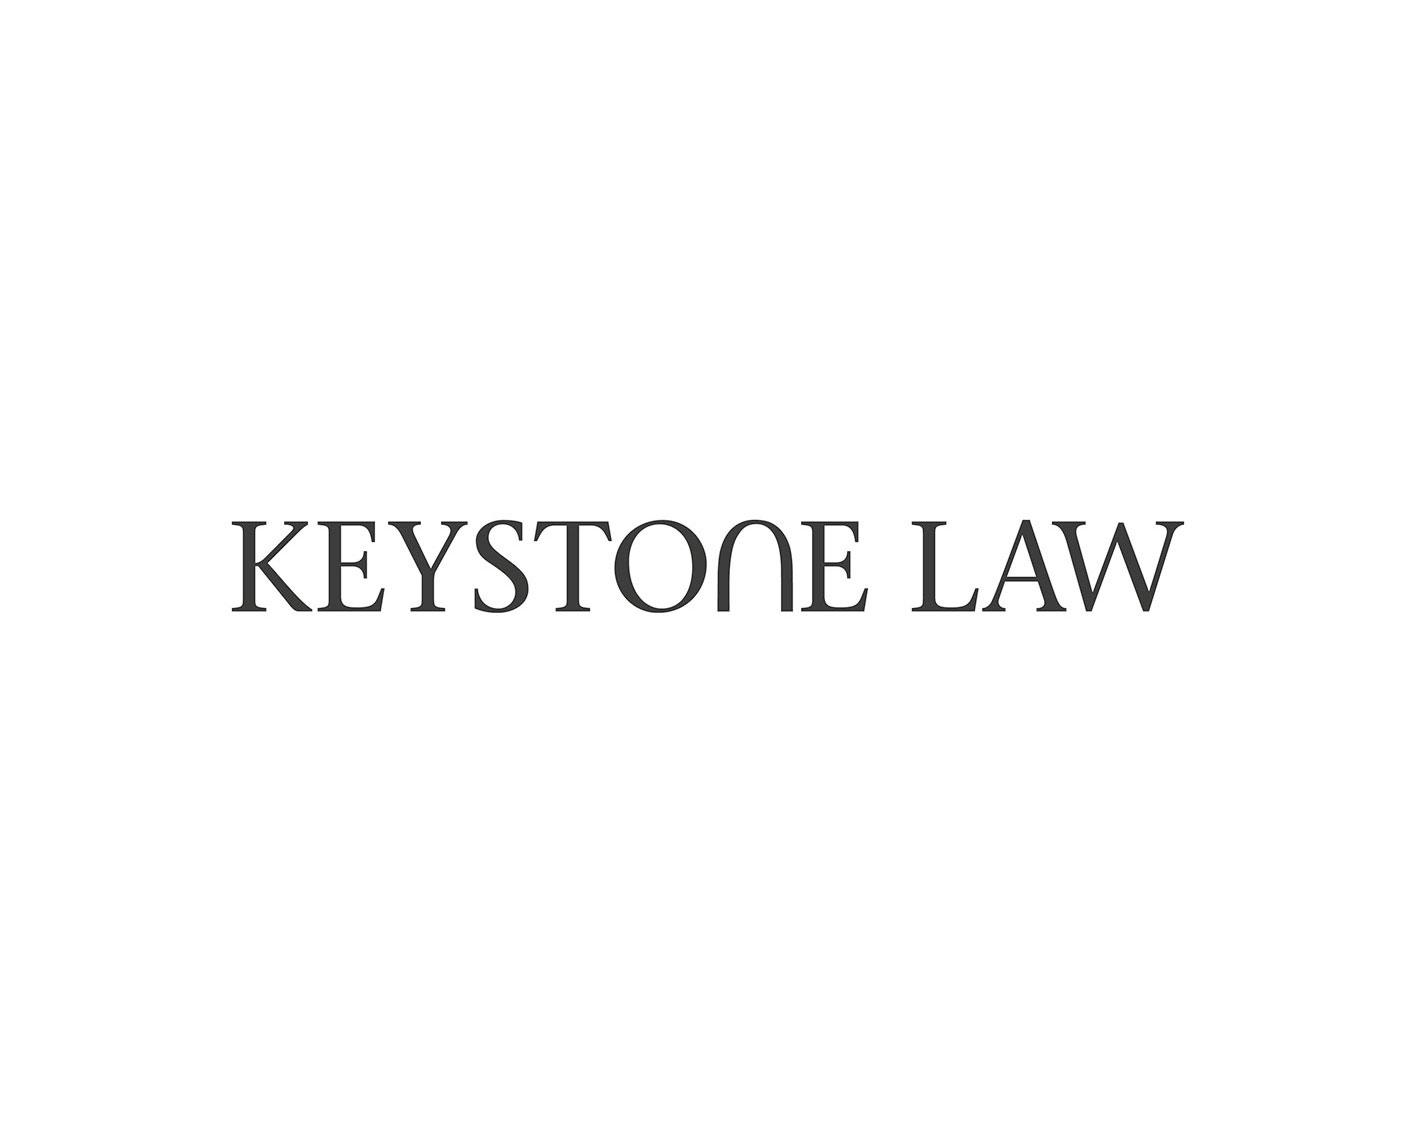 Keystone_90Blk_Opti.jpg